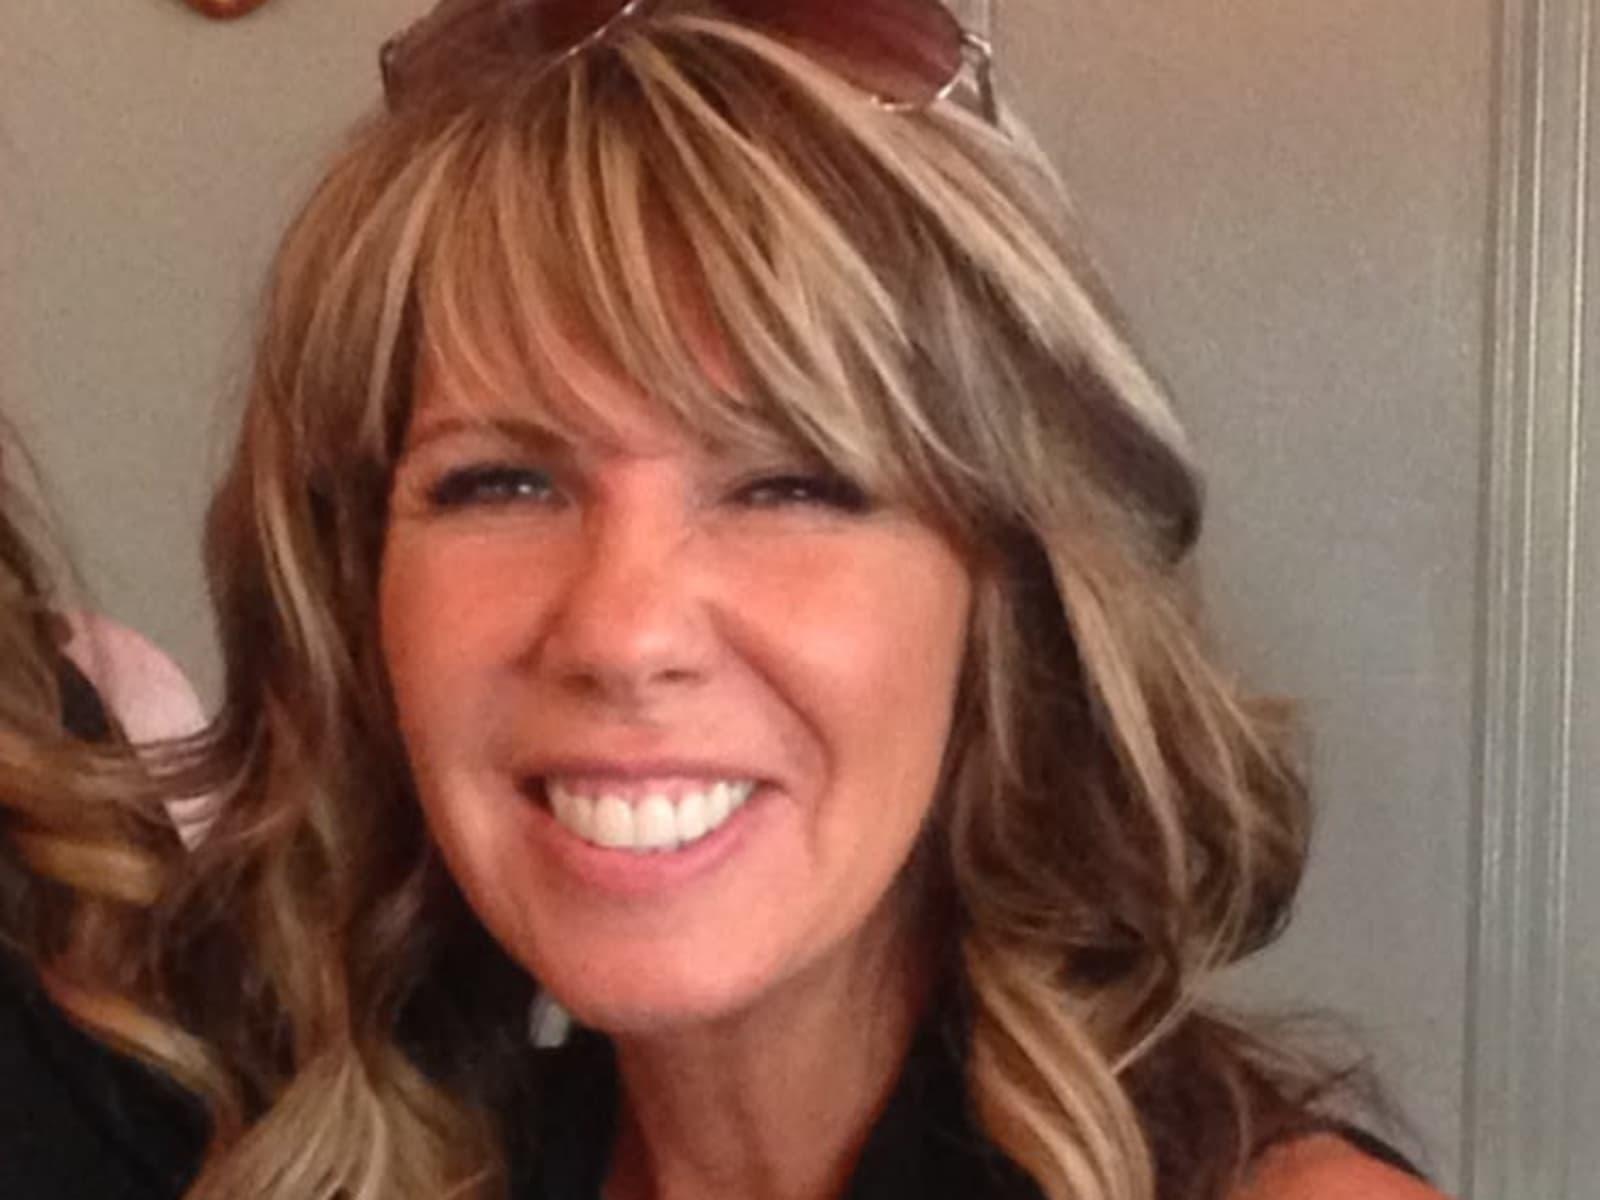 Susan from Stratford, Ontario, Canada